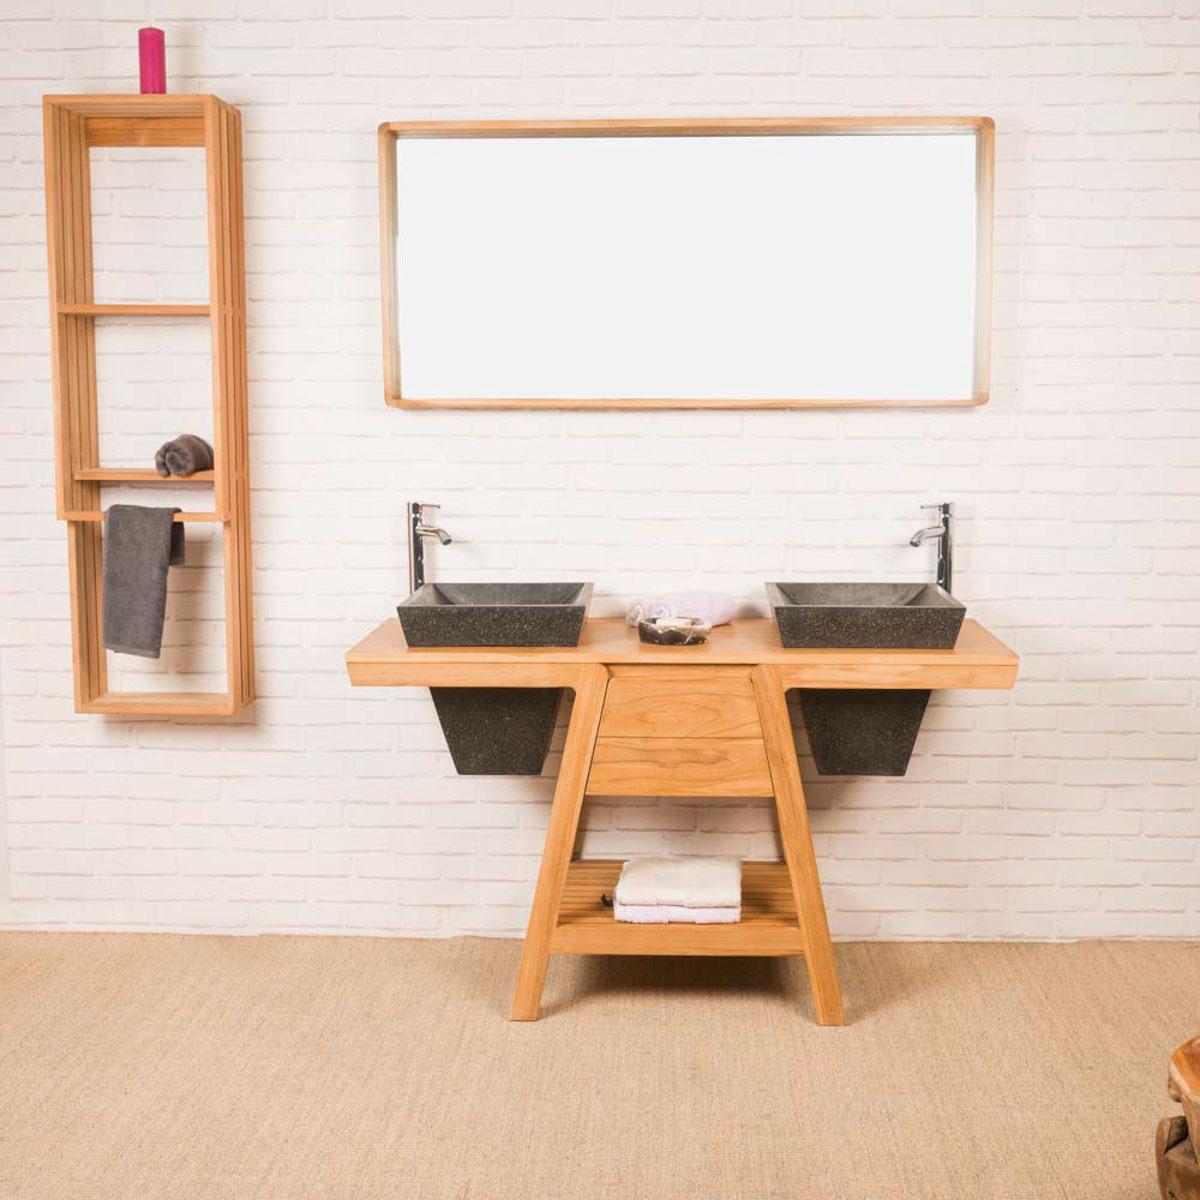 Meuble salle de bain meuble sous vasque teck kh ops 140 cm for Meuble sous vasque